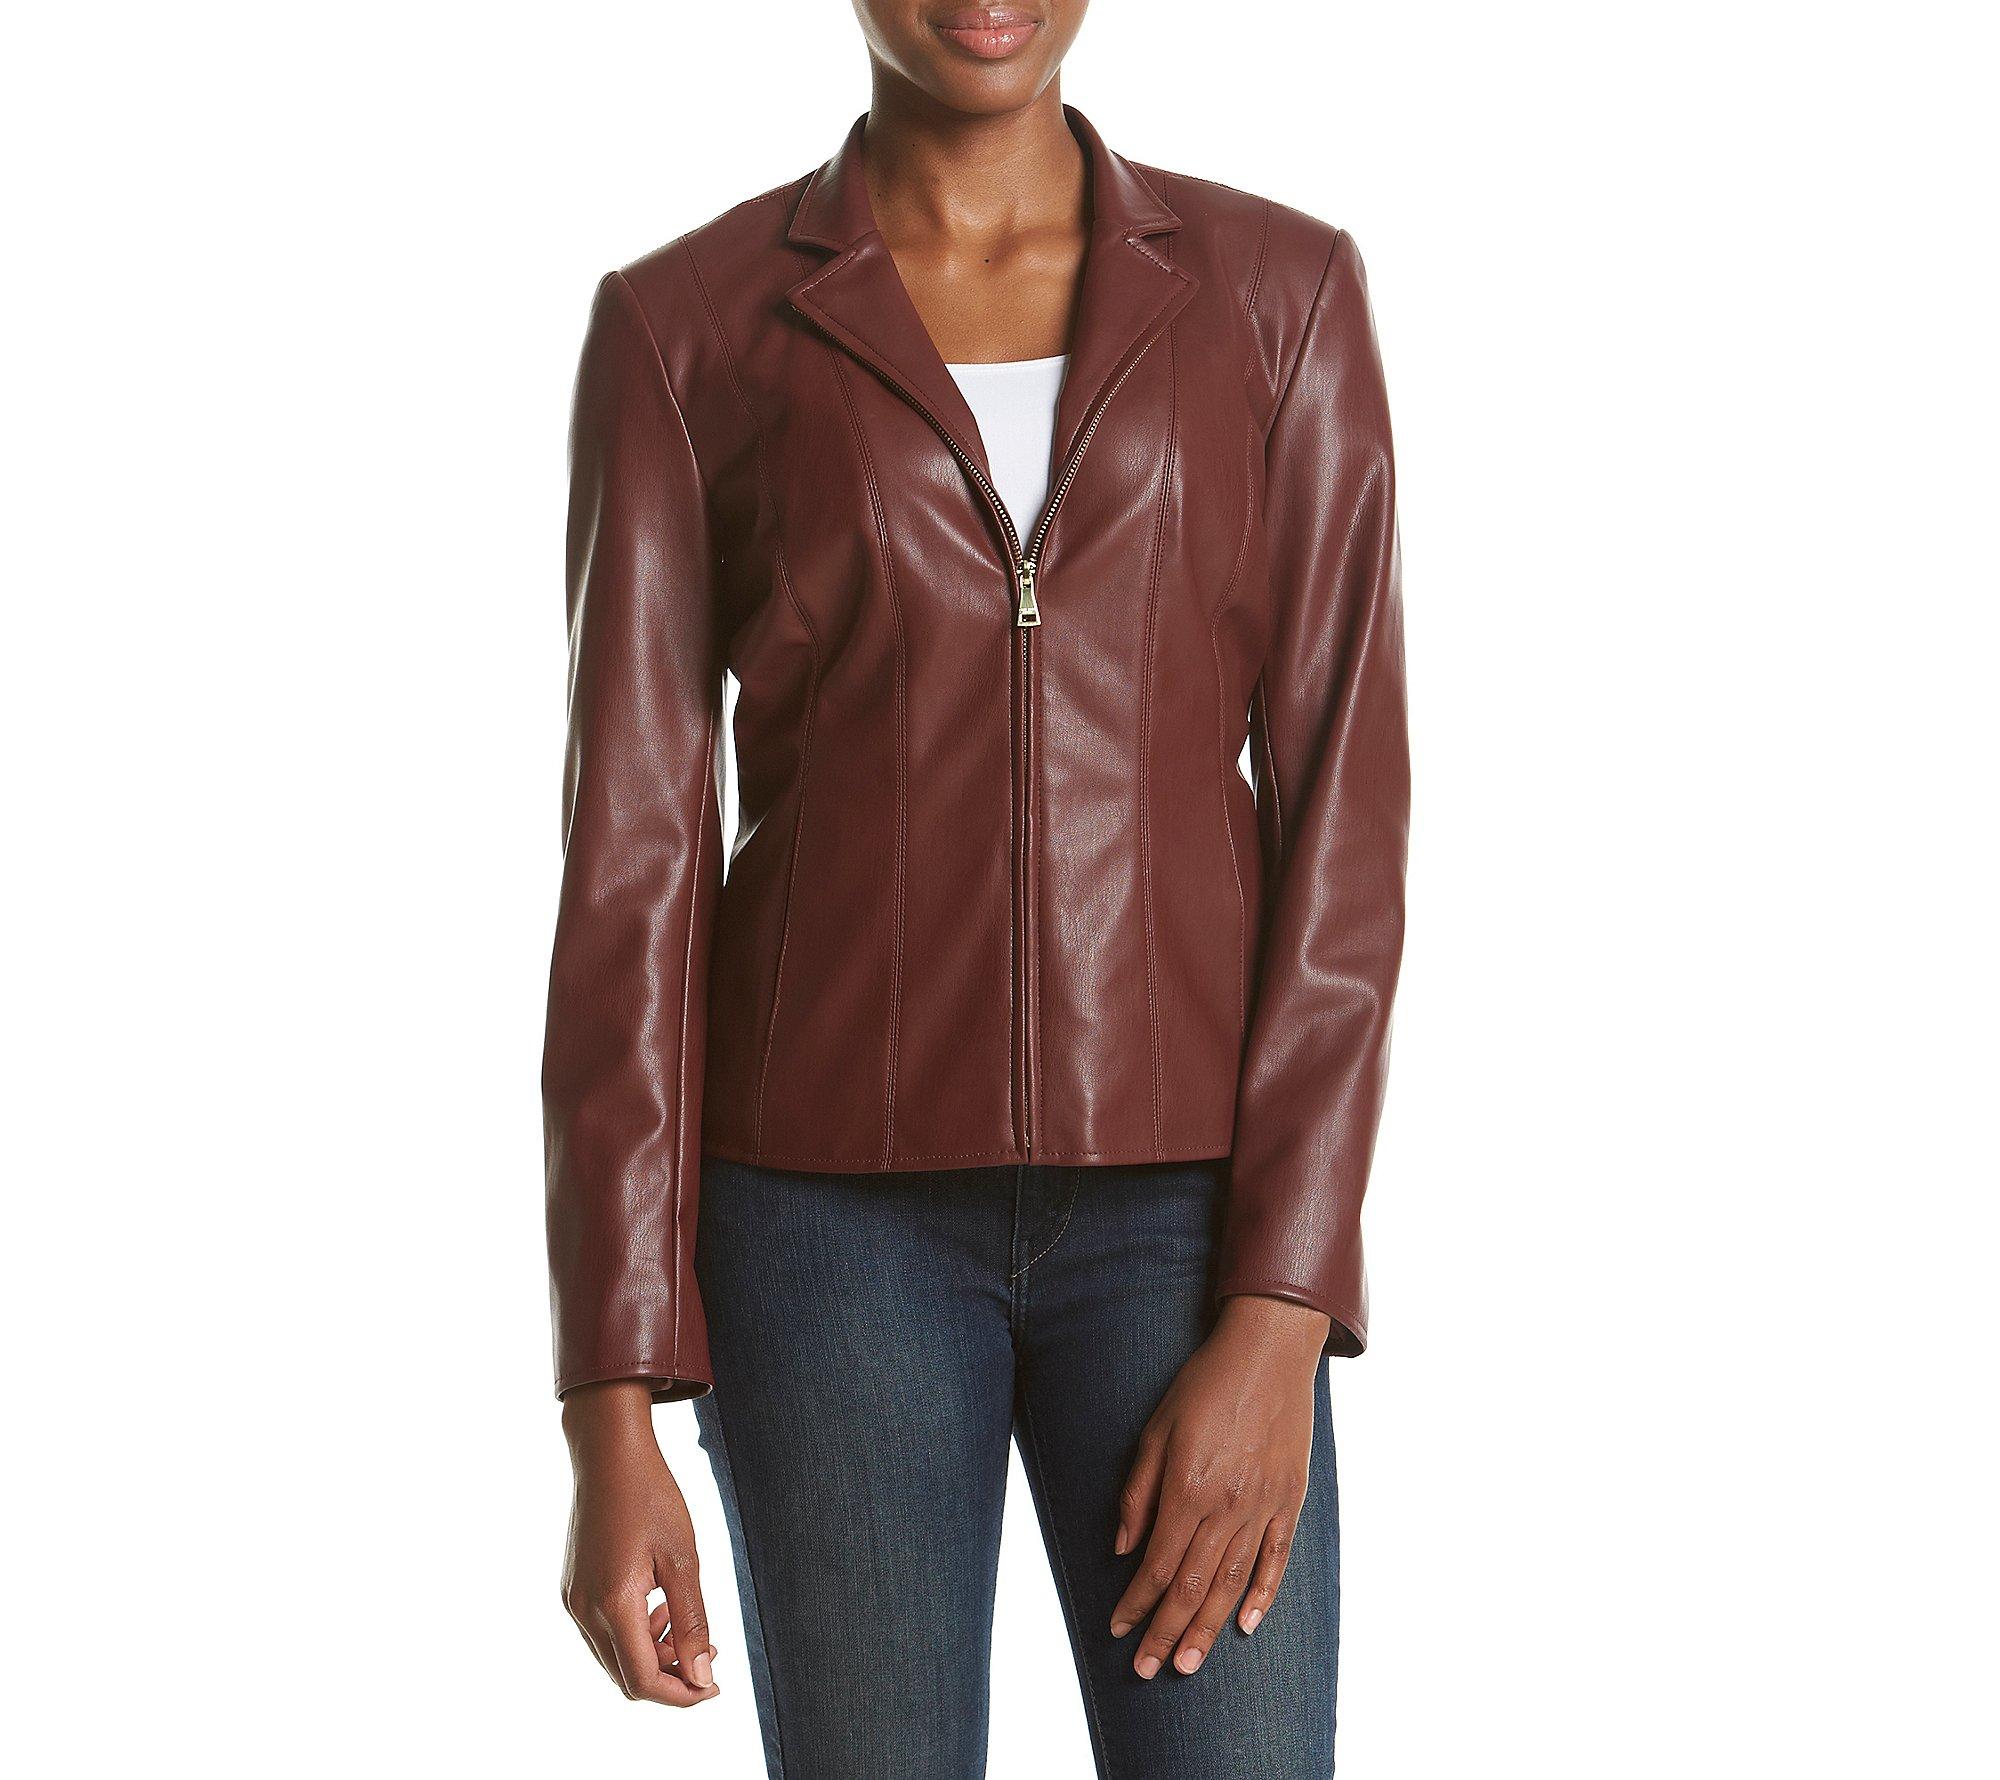 Cole Haan Wing Collar Scuba Jacket Burgundy Medium, Burgundy, Size Medium